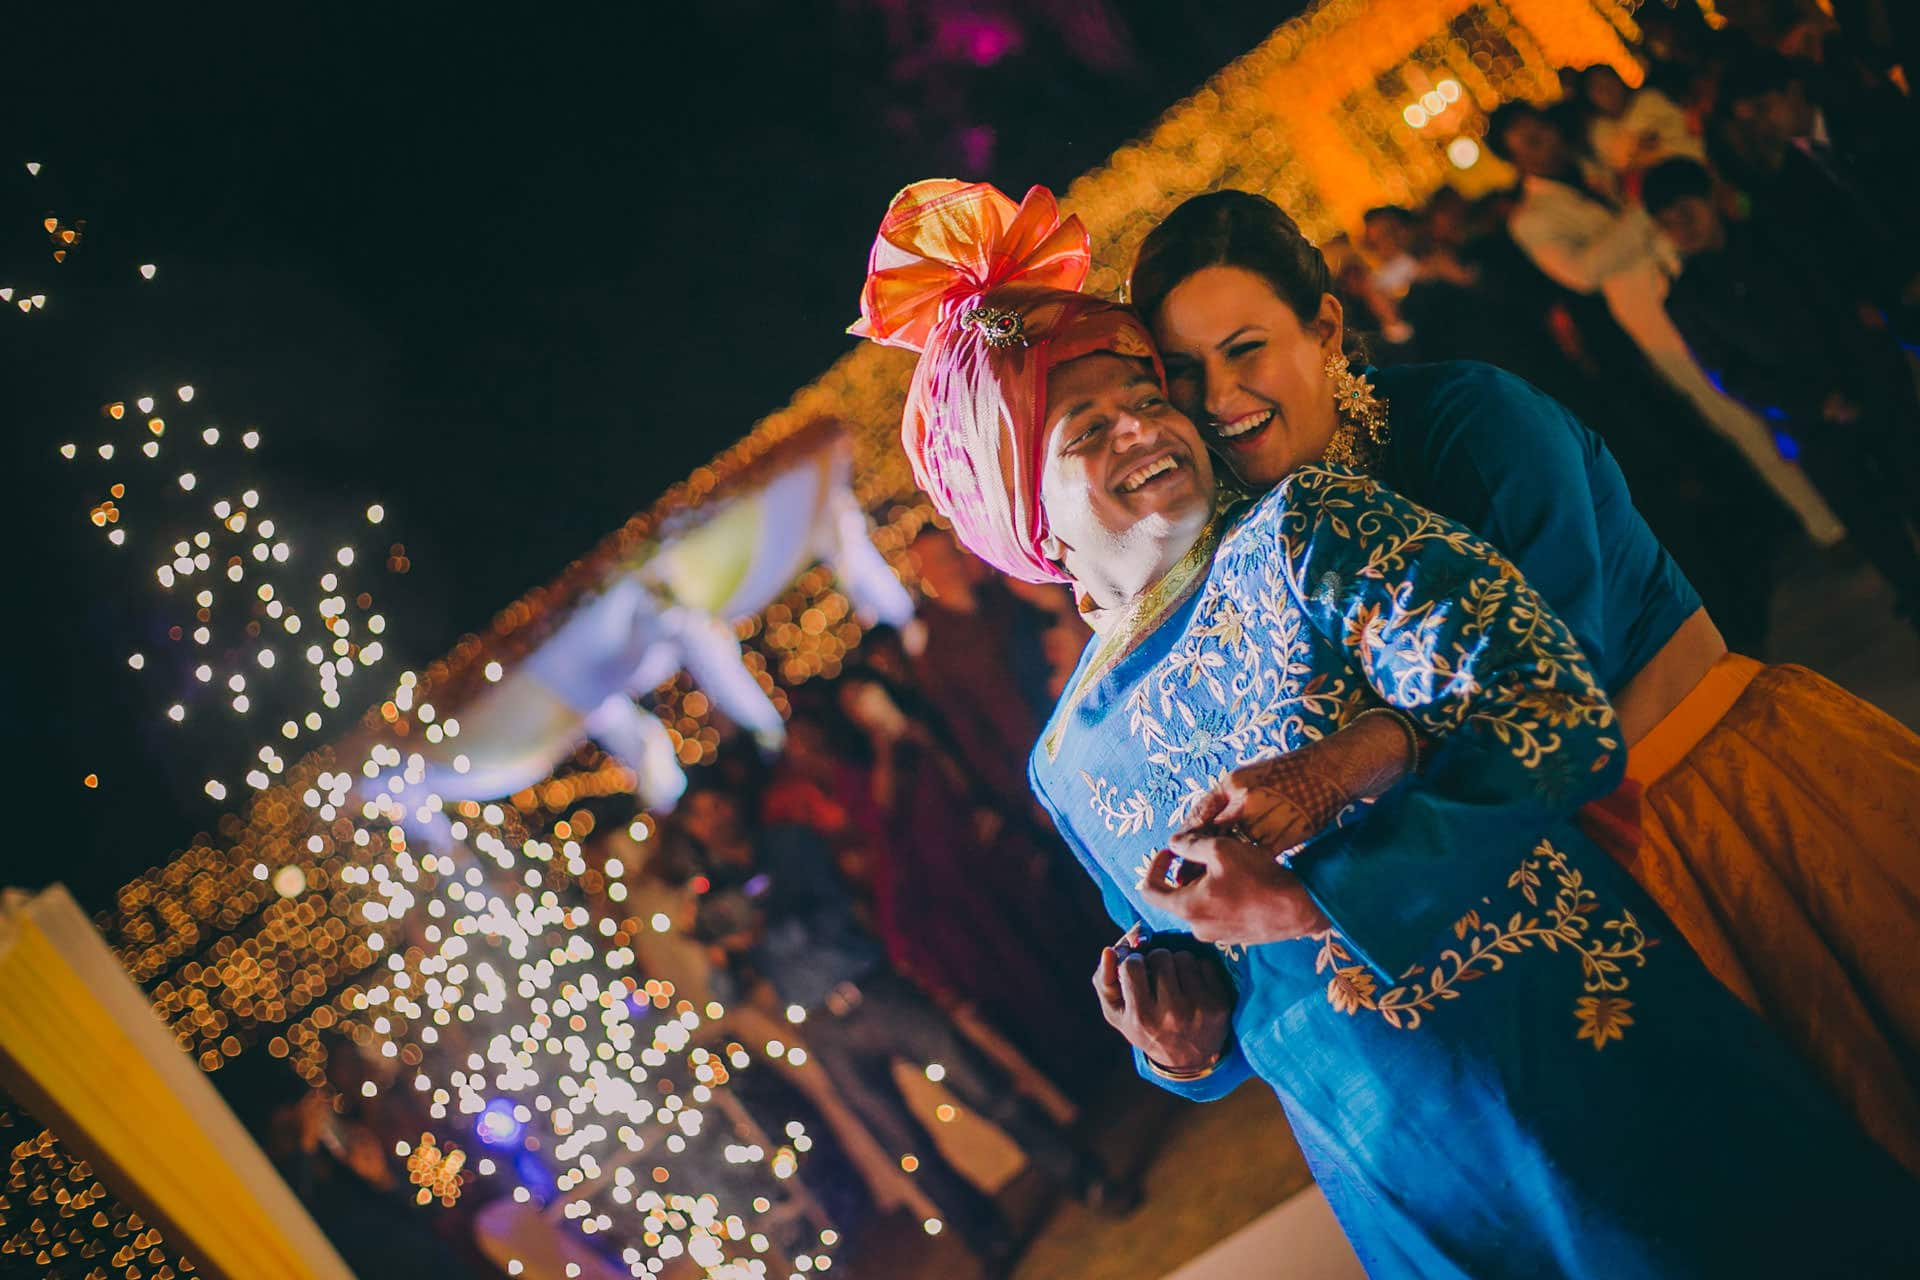 wedding reception photos at golconda resorts